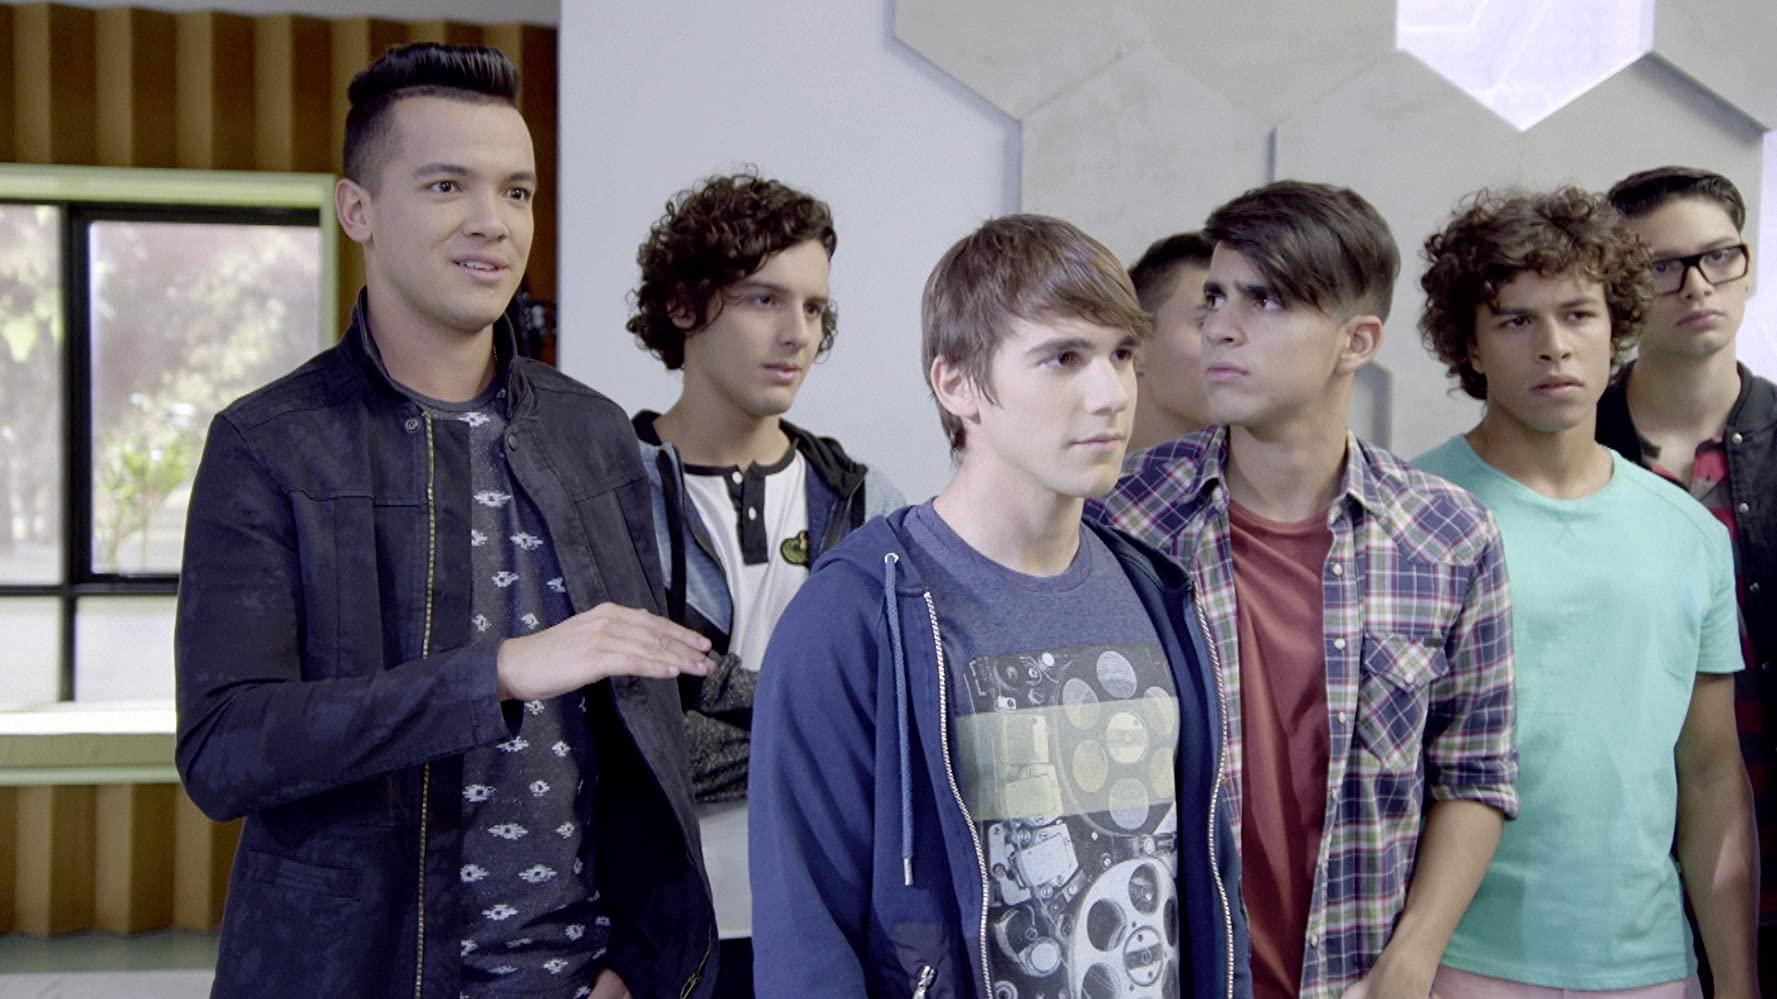 Unsprezece 11 Sezonul 2 Episodul 11 Dublat în Română